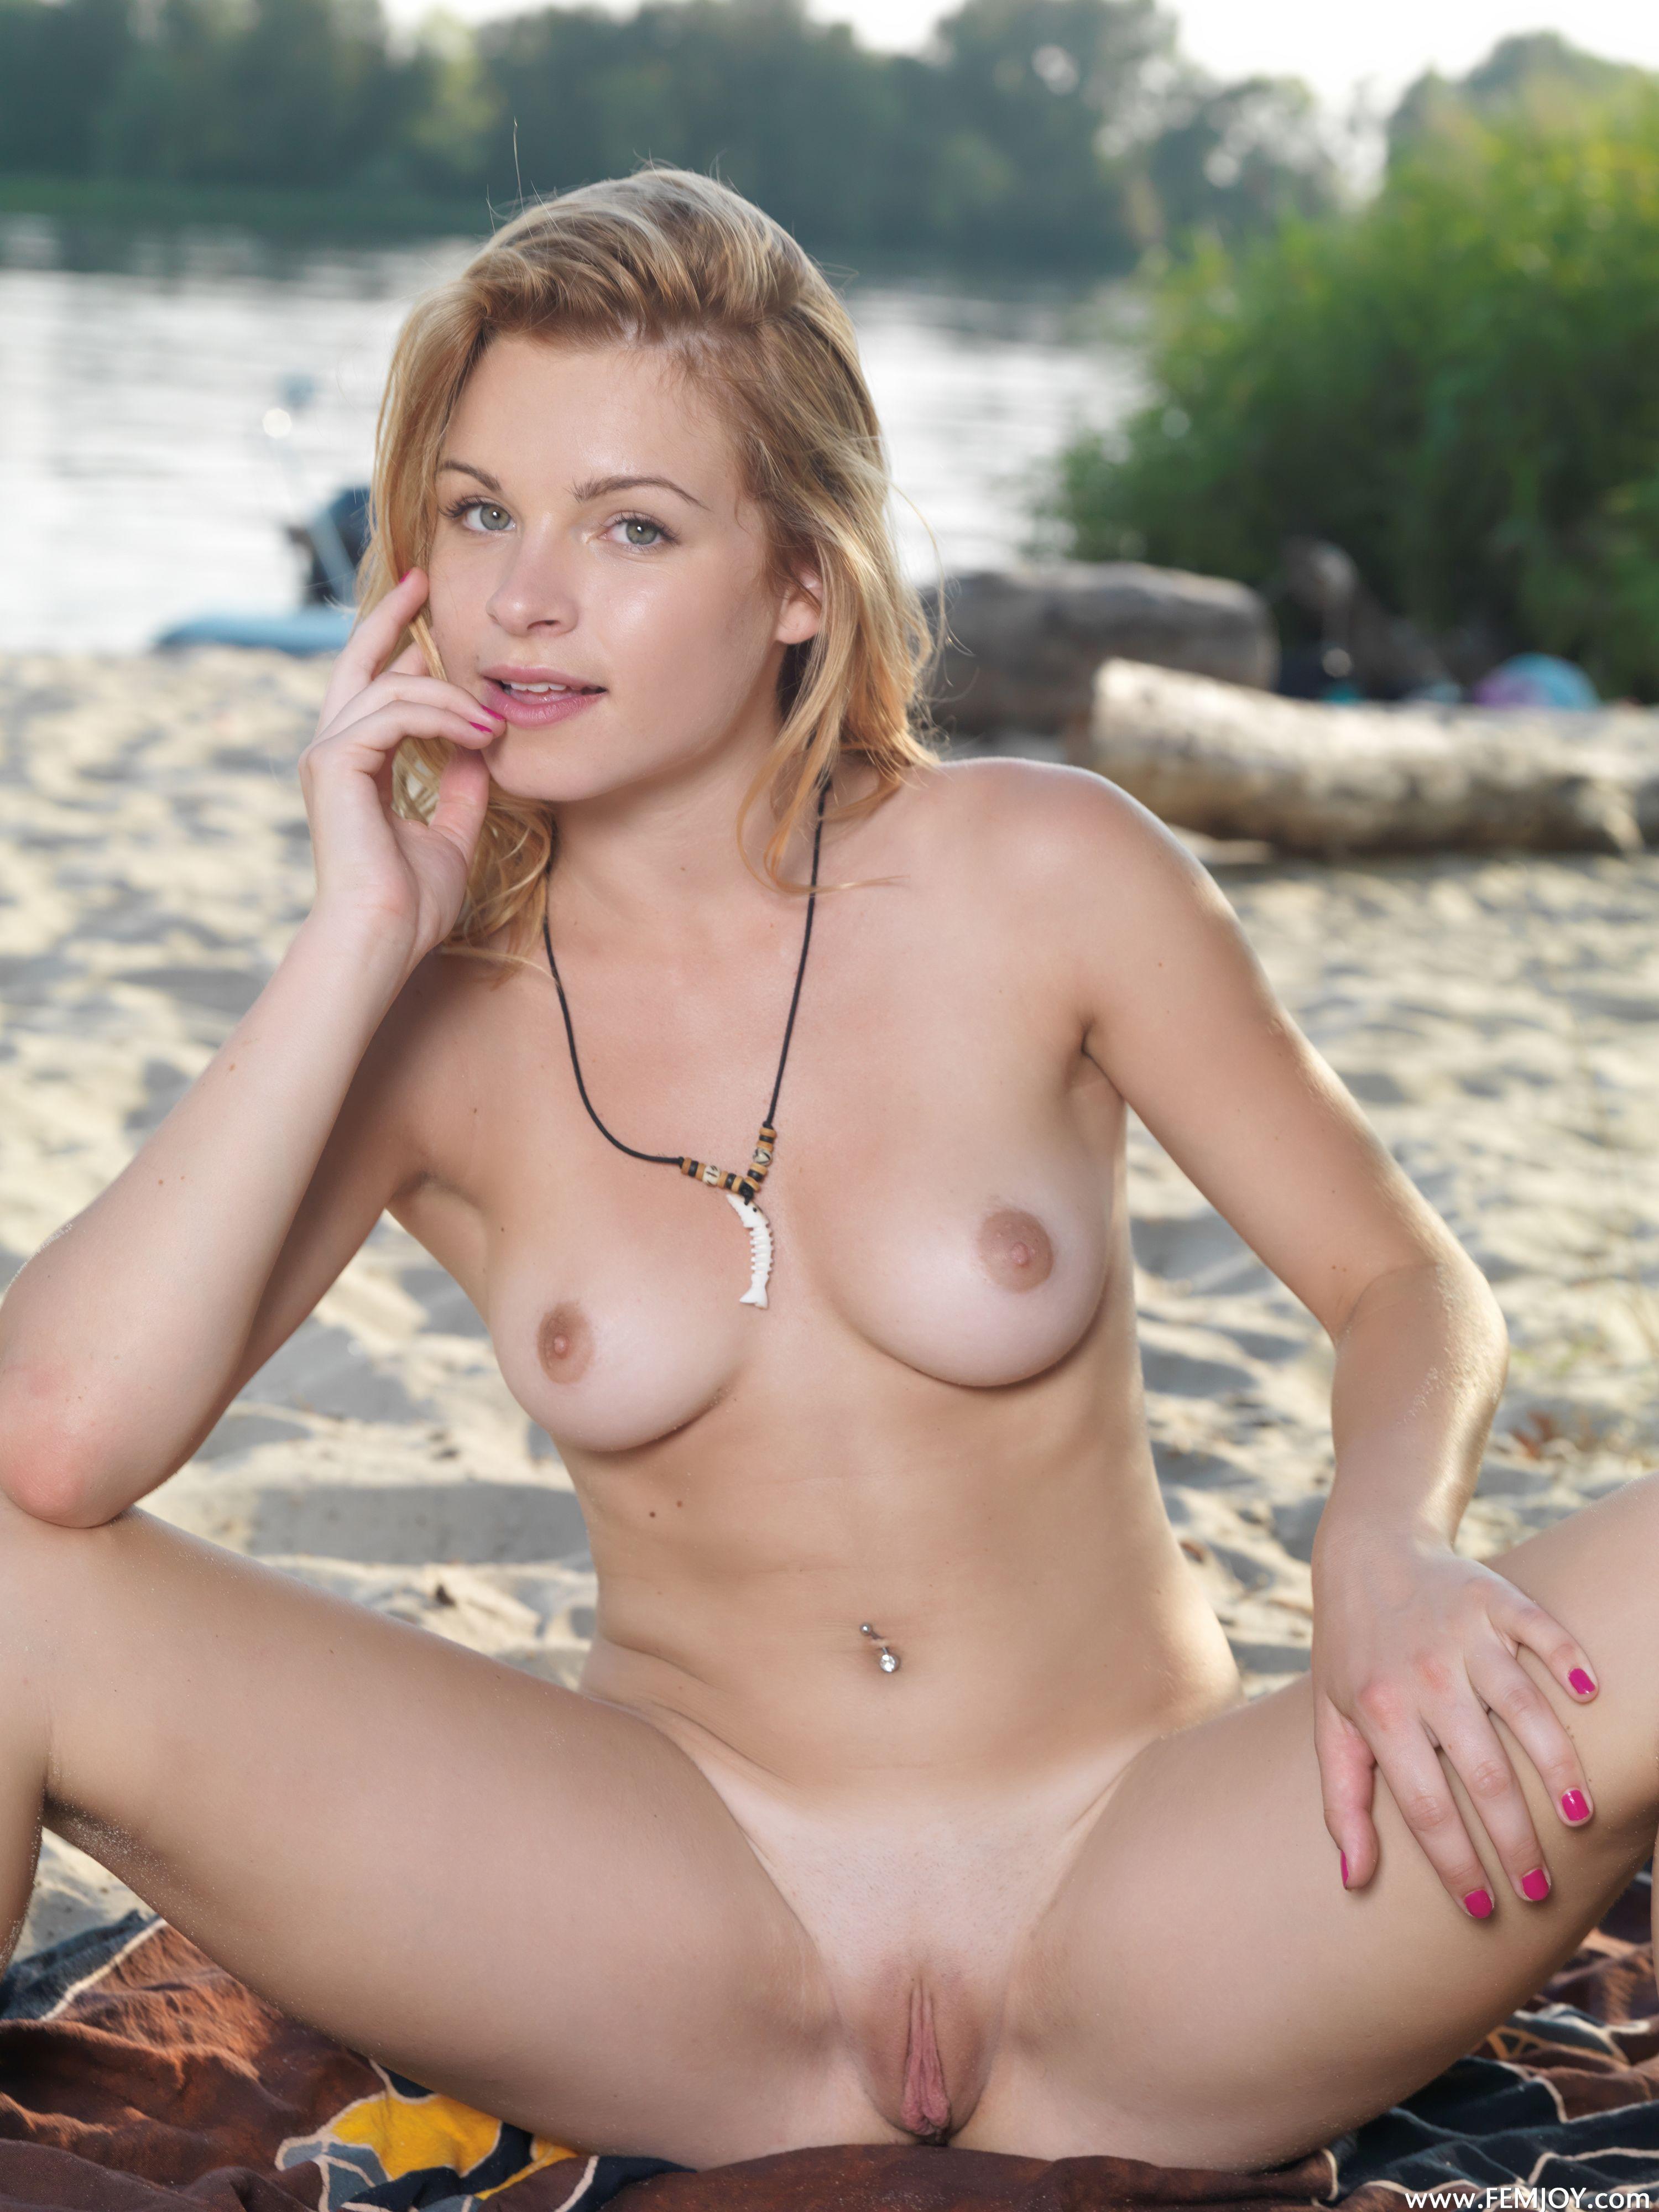 http://i3.imageban.ru/out/2014/02/09/703de159f114580a81c379160fe31a8a.jpg